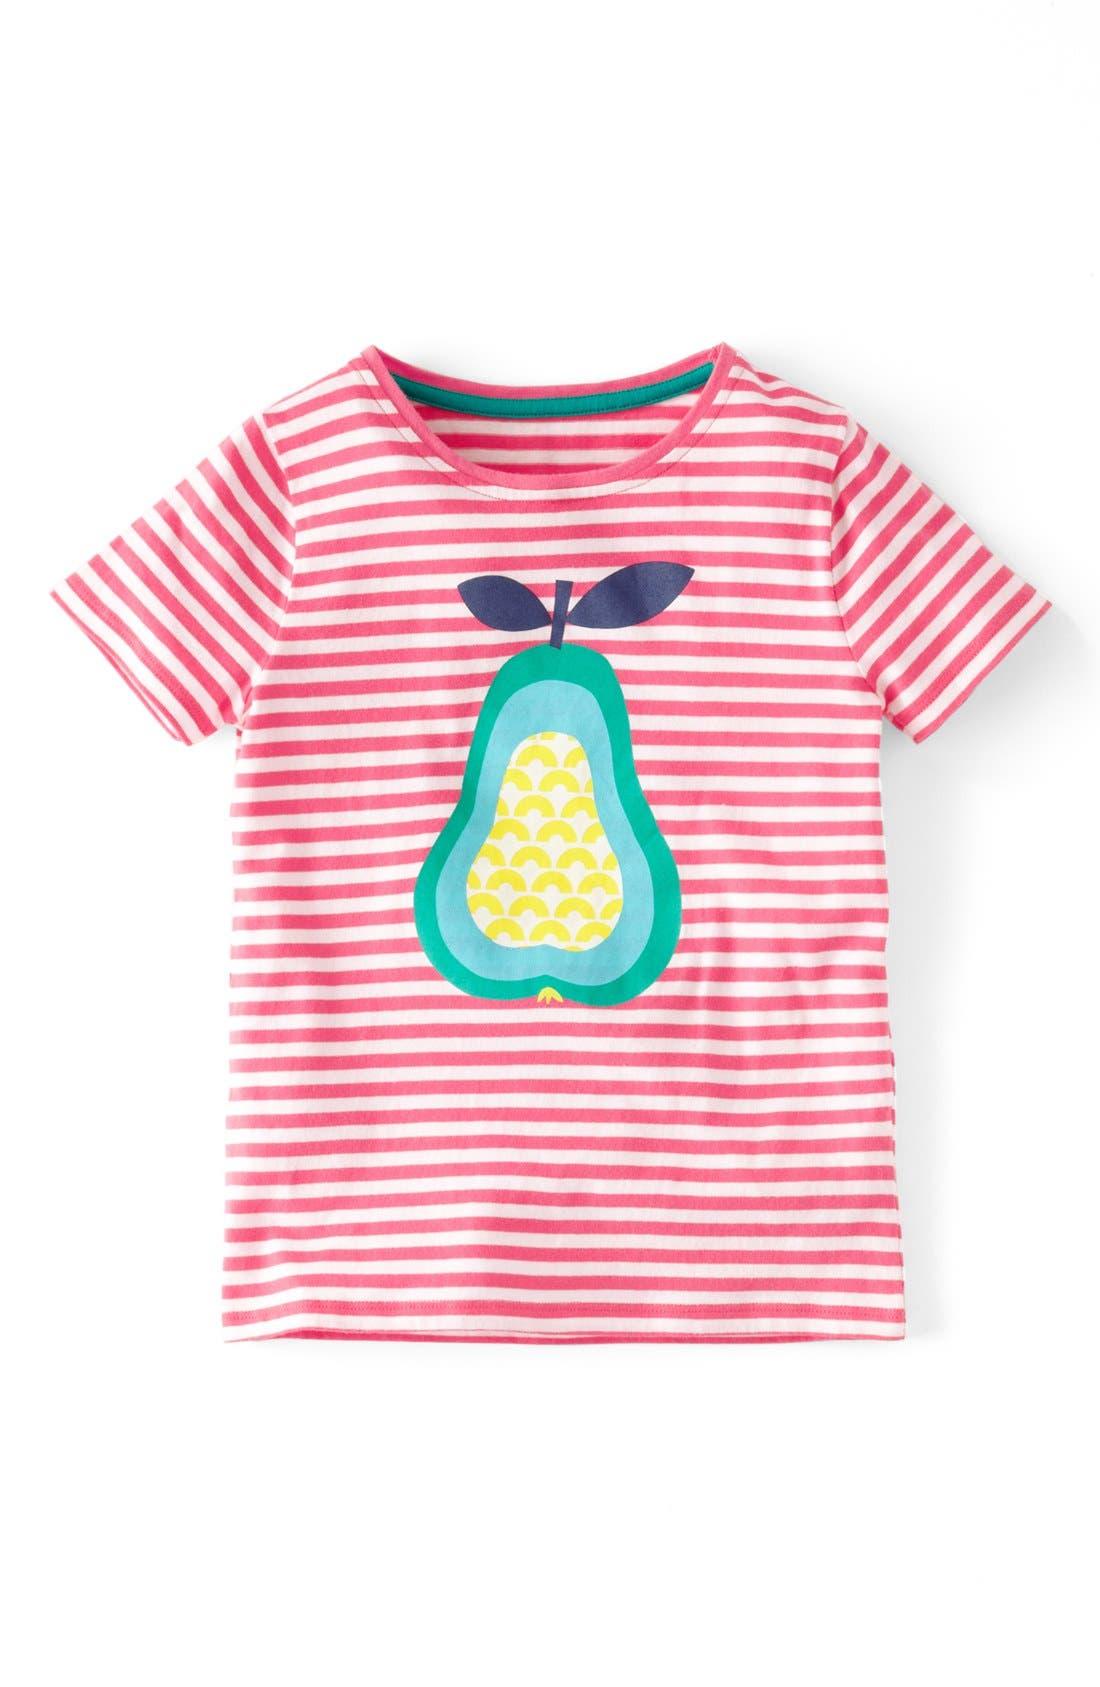 Main Image - Mini Boden 'Retro' Print Tee (Toddler Girls, Little Girls & Big Girls)(Online Only)